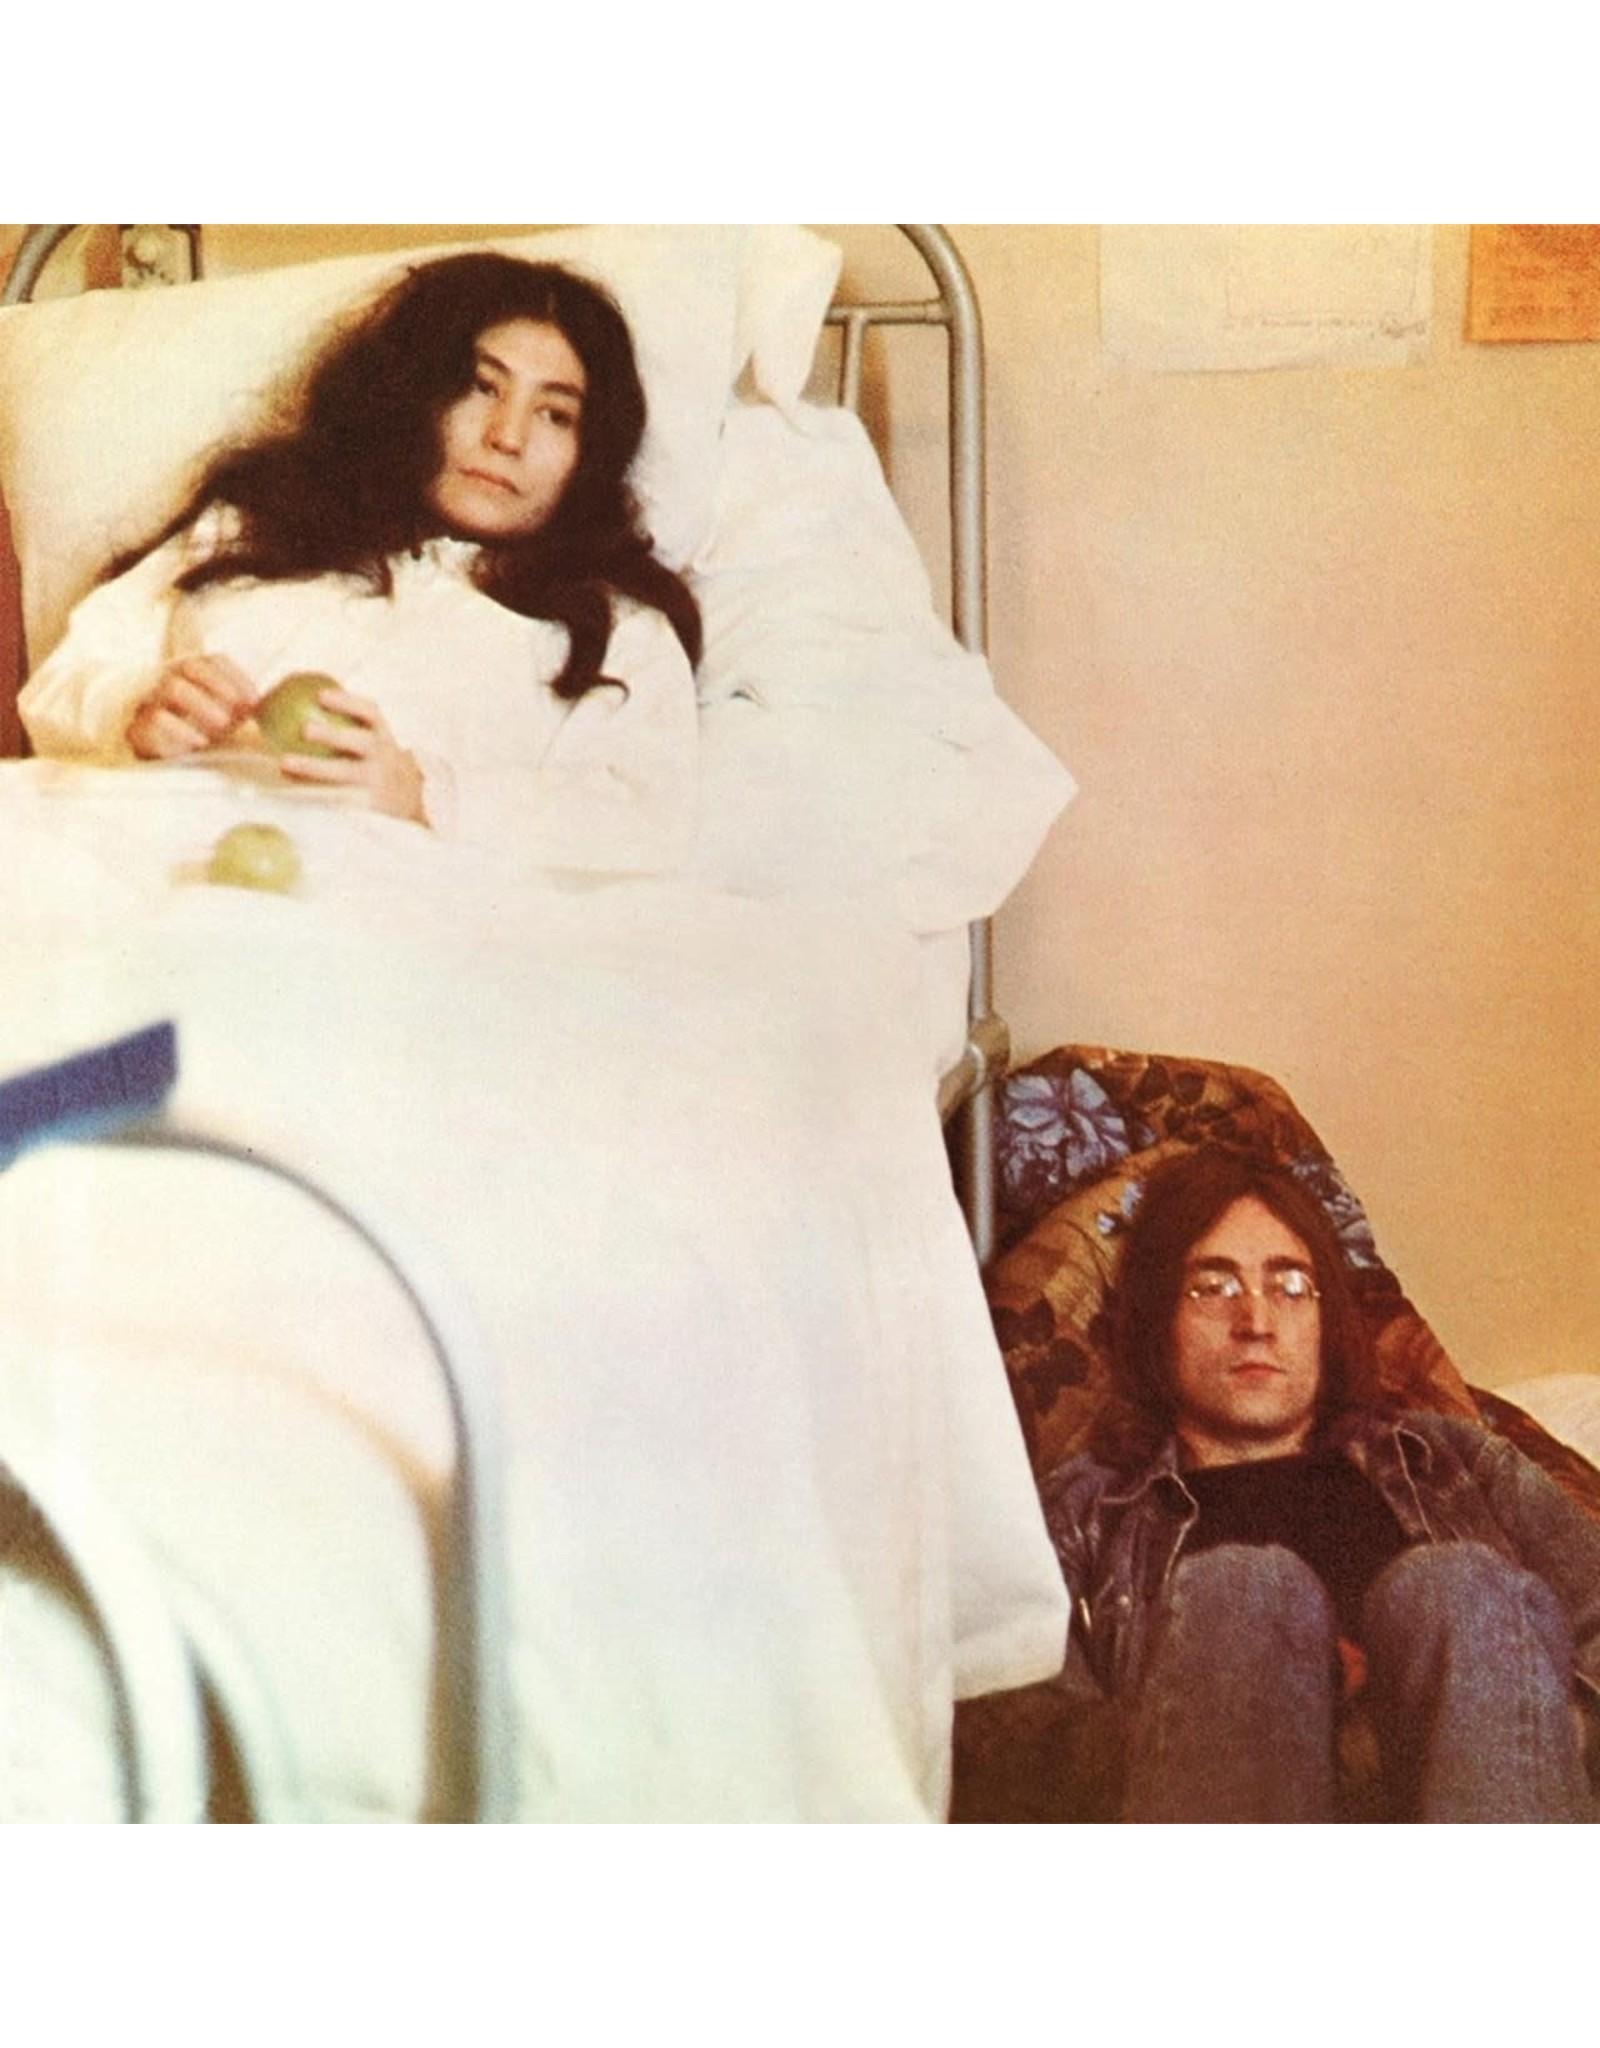 Lennon, John & Ono, Yoko - Unfinished Music No.2: Life With Lions CD